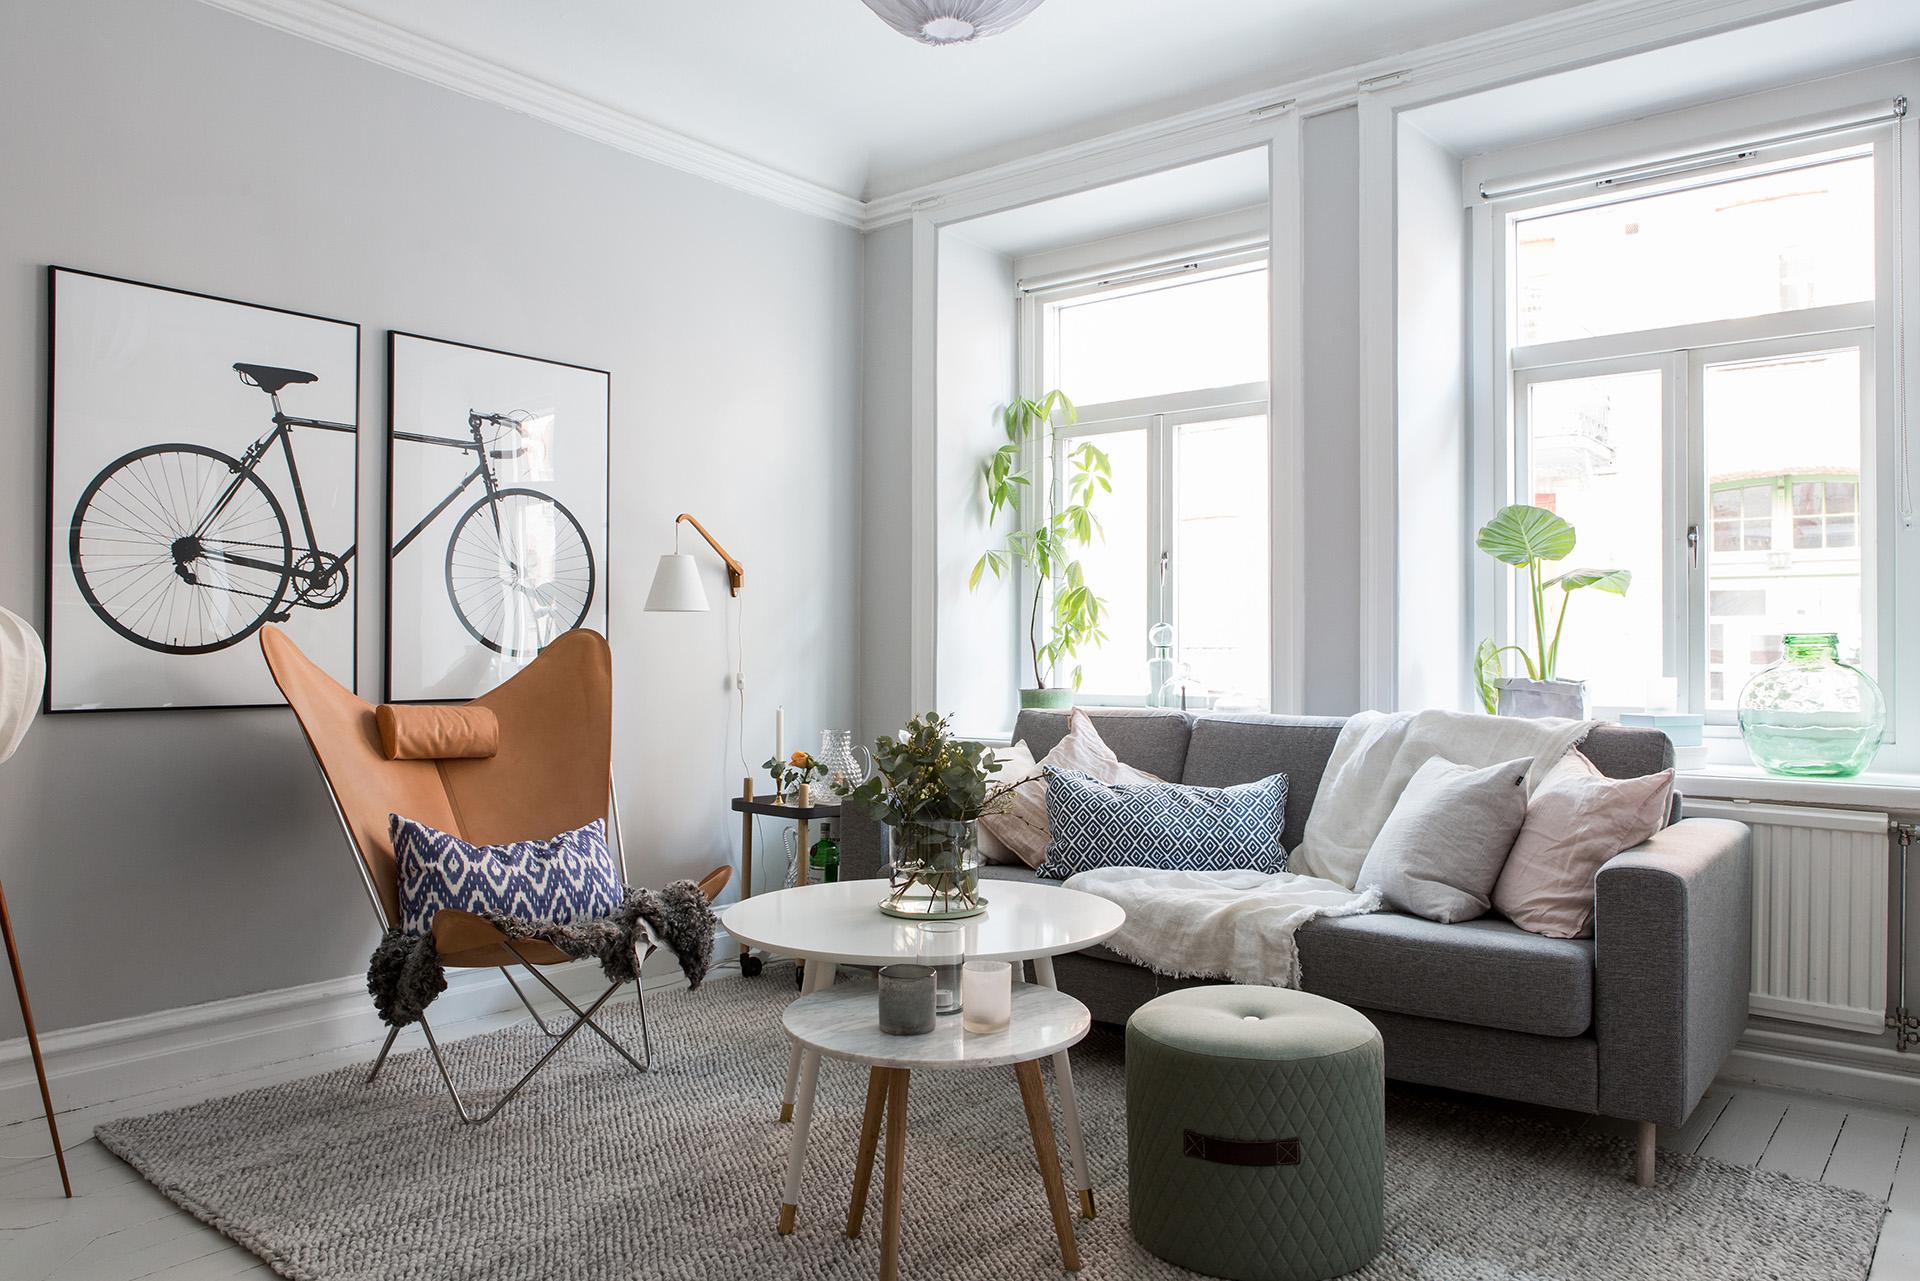 Grosse Ideen fr kleine Budgets  Sweet Home